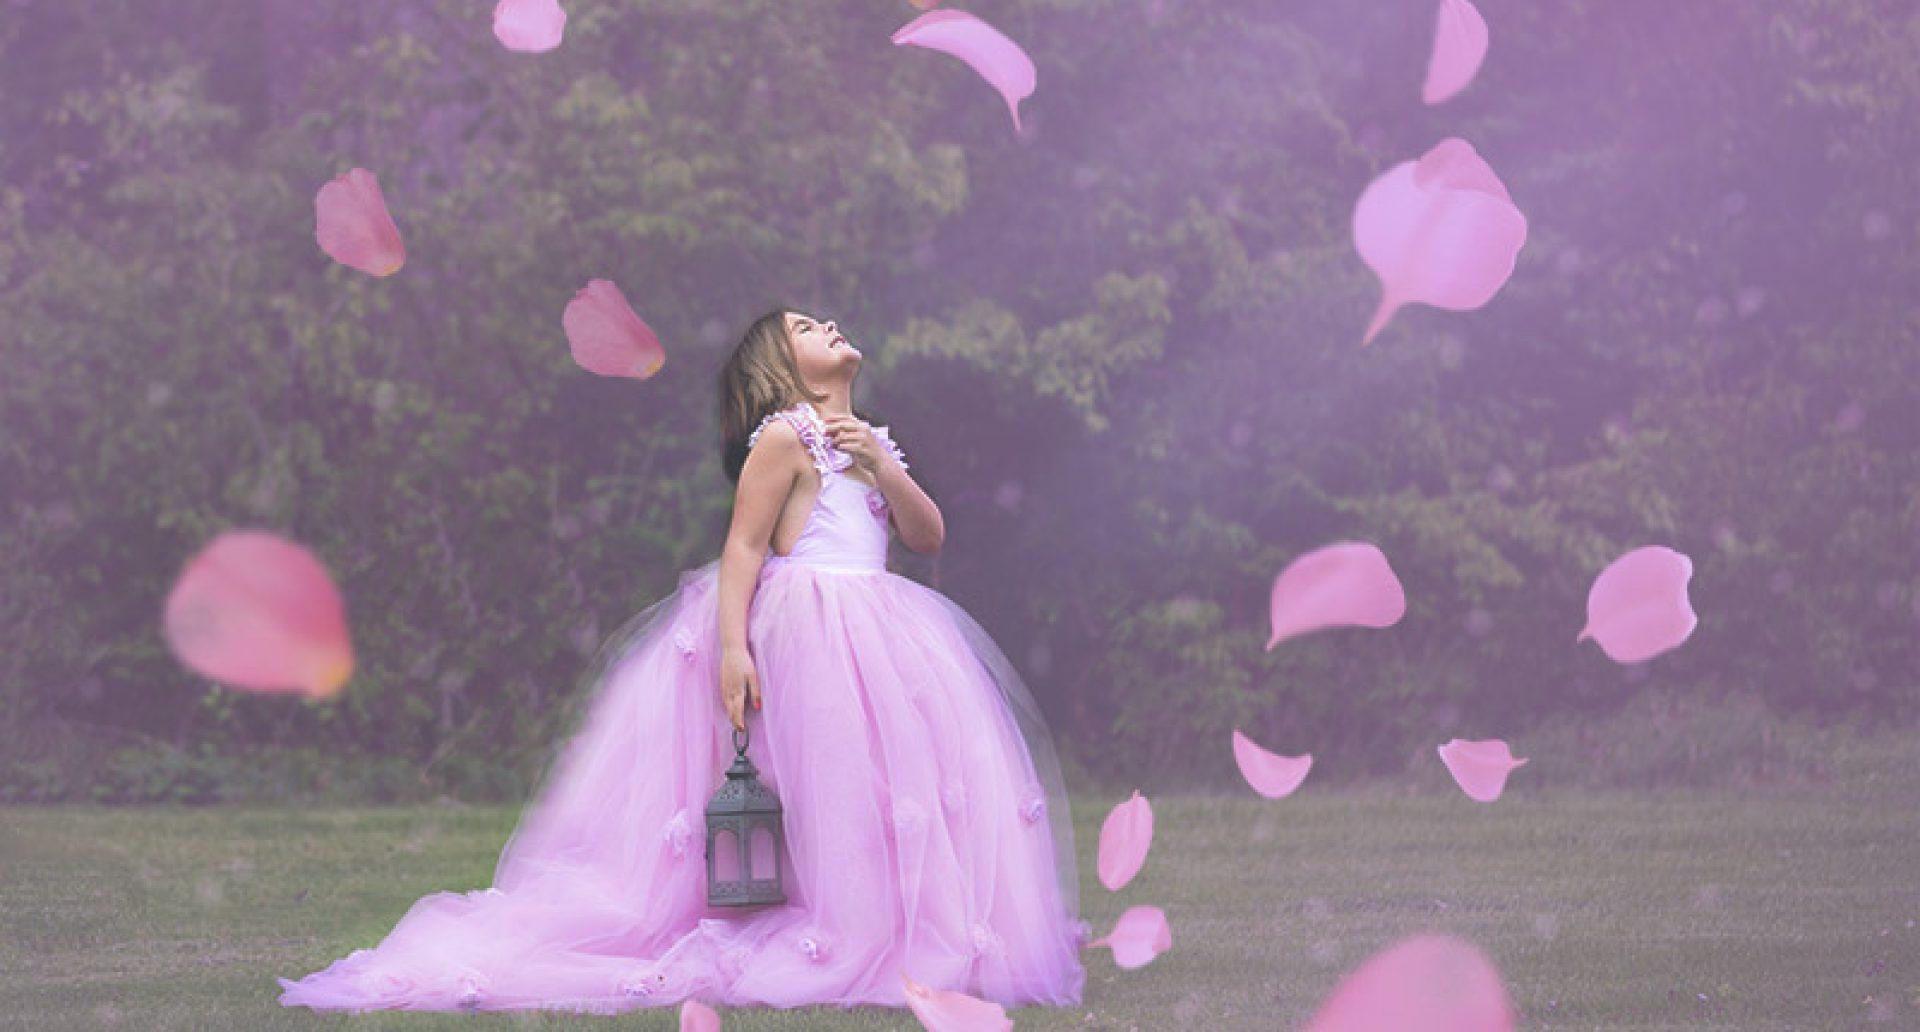 Magical-Child-photography-illinois